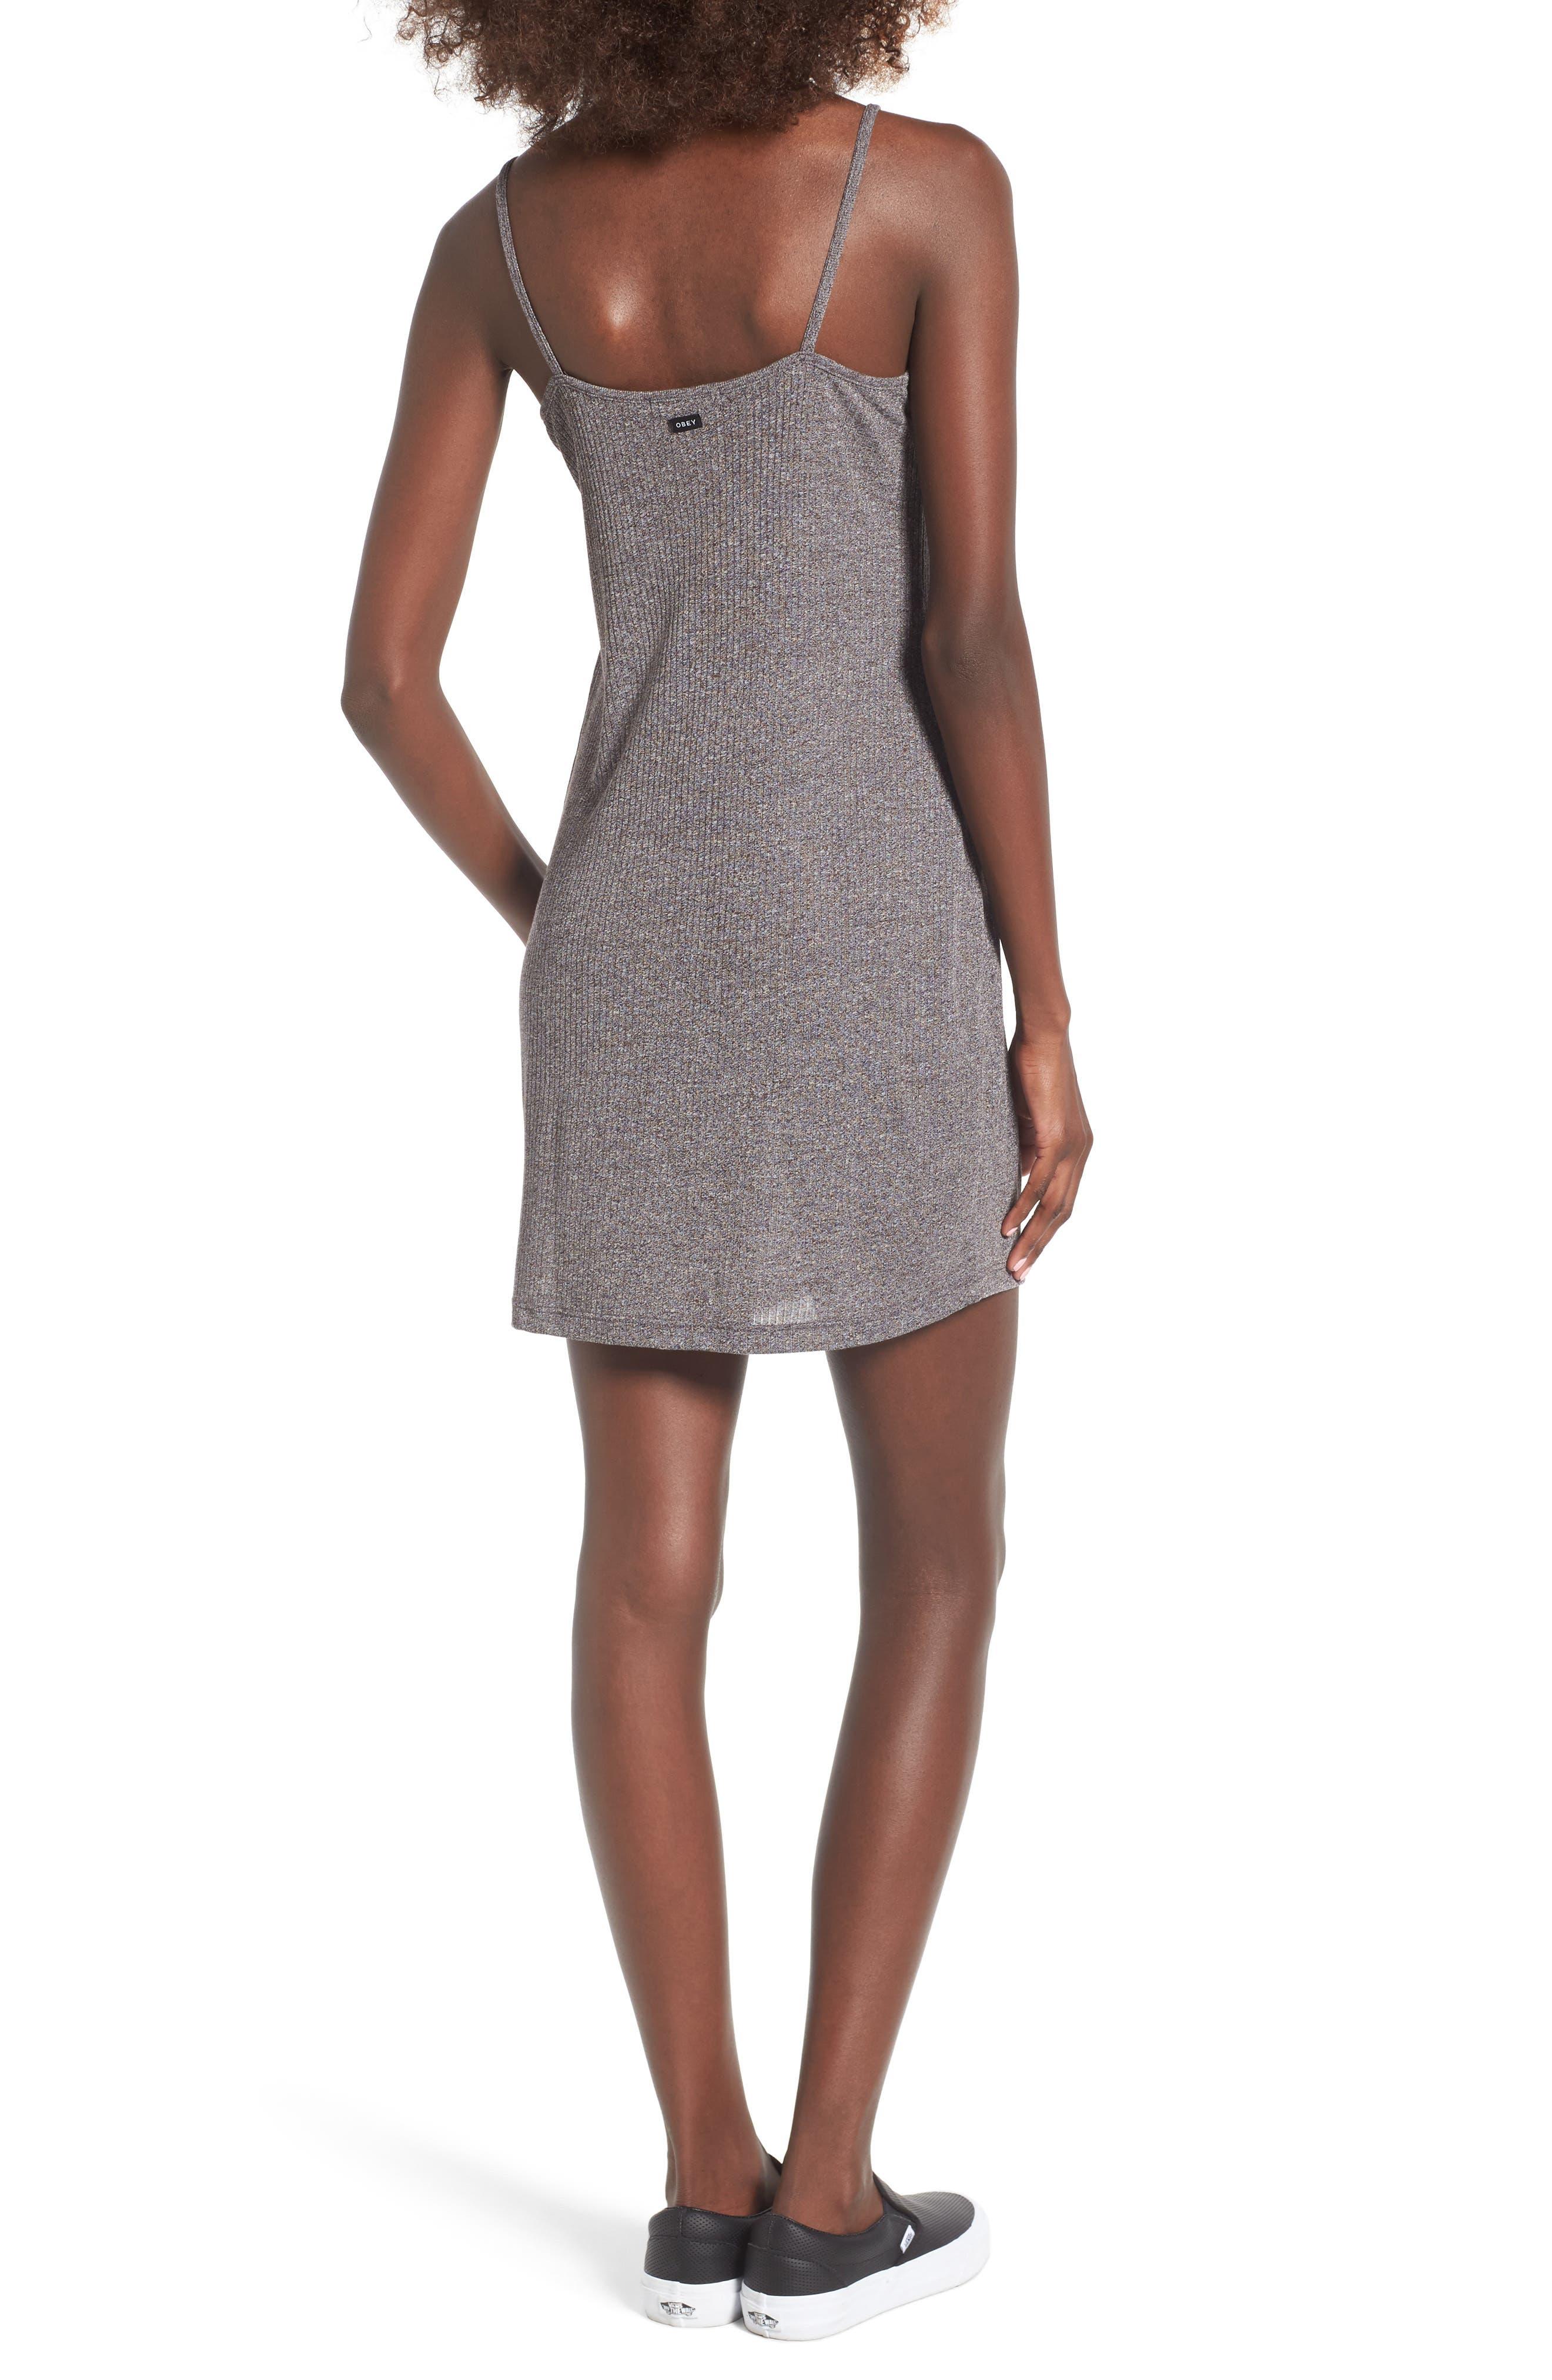 Barbados Rib Knit Dress,                             Alternate thumbnail 2, color,                             020